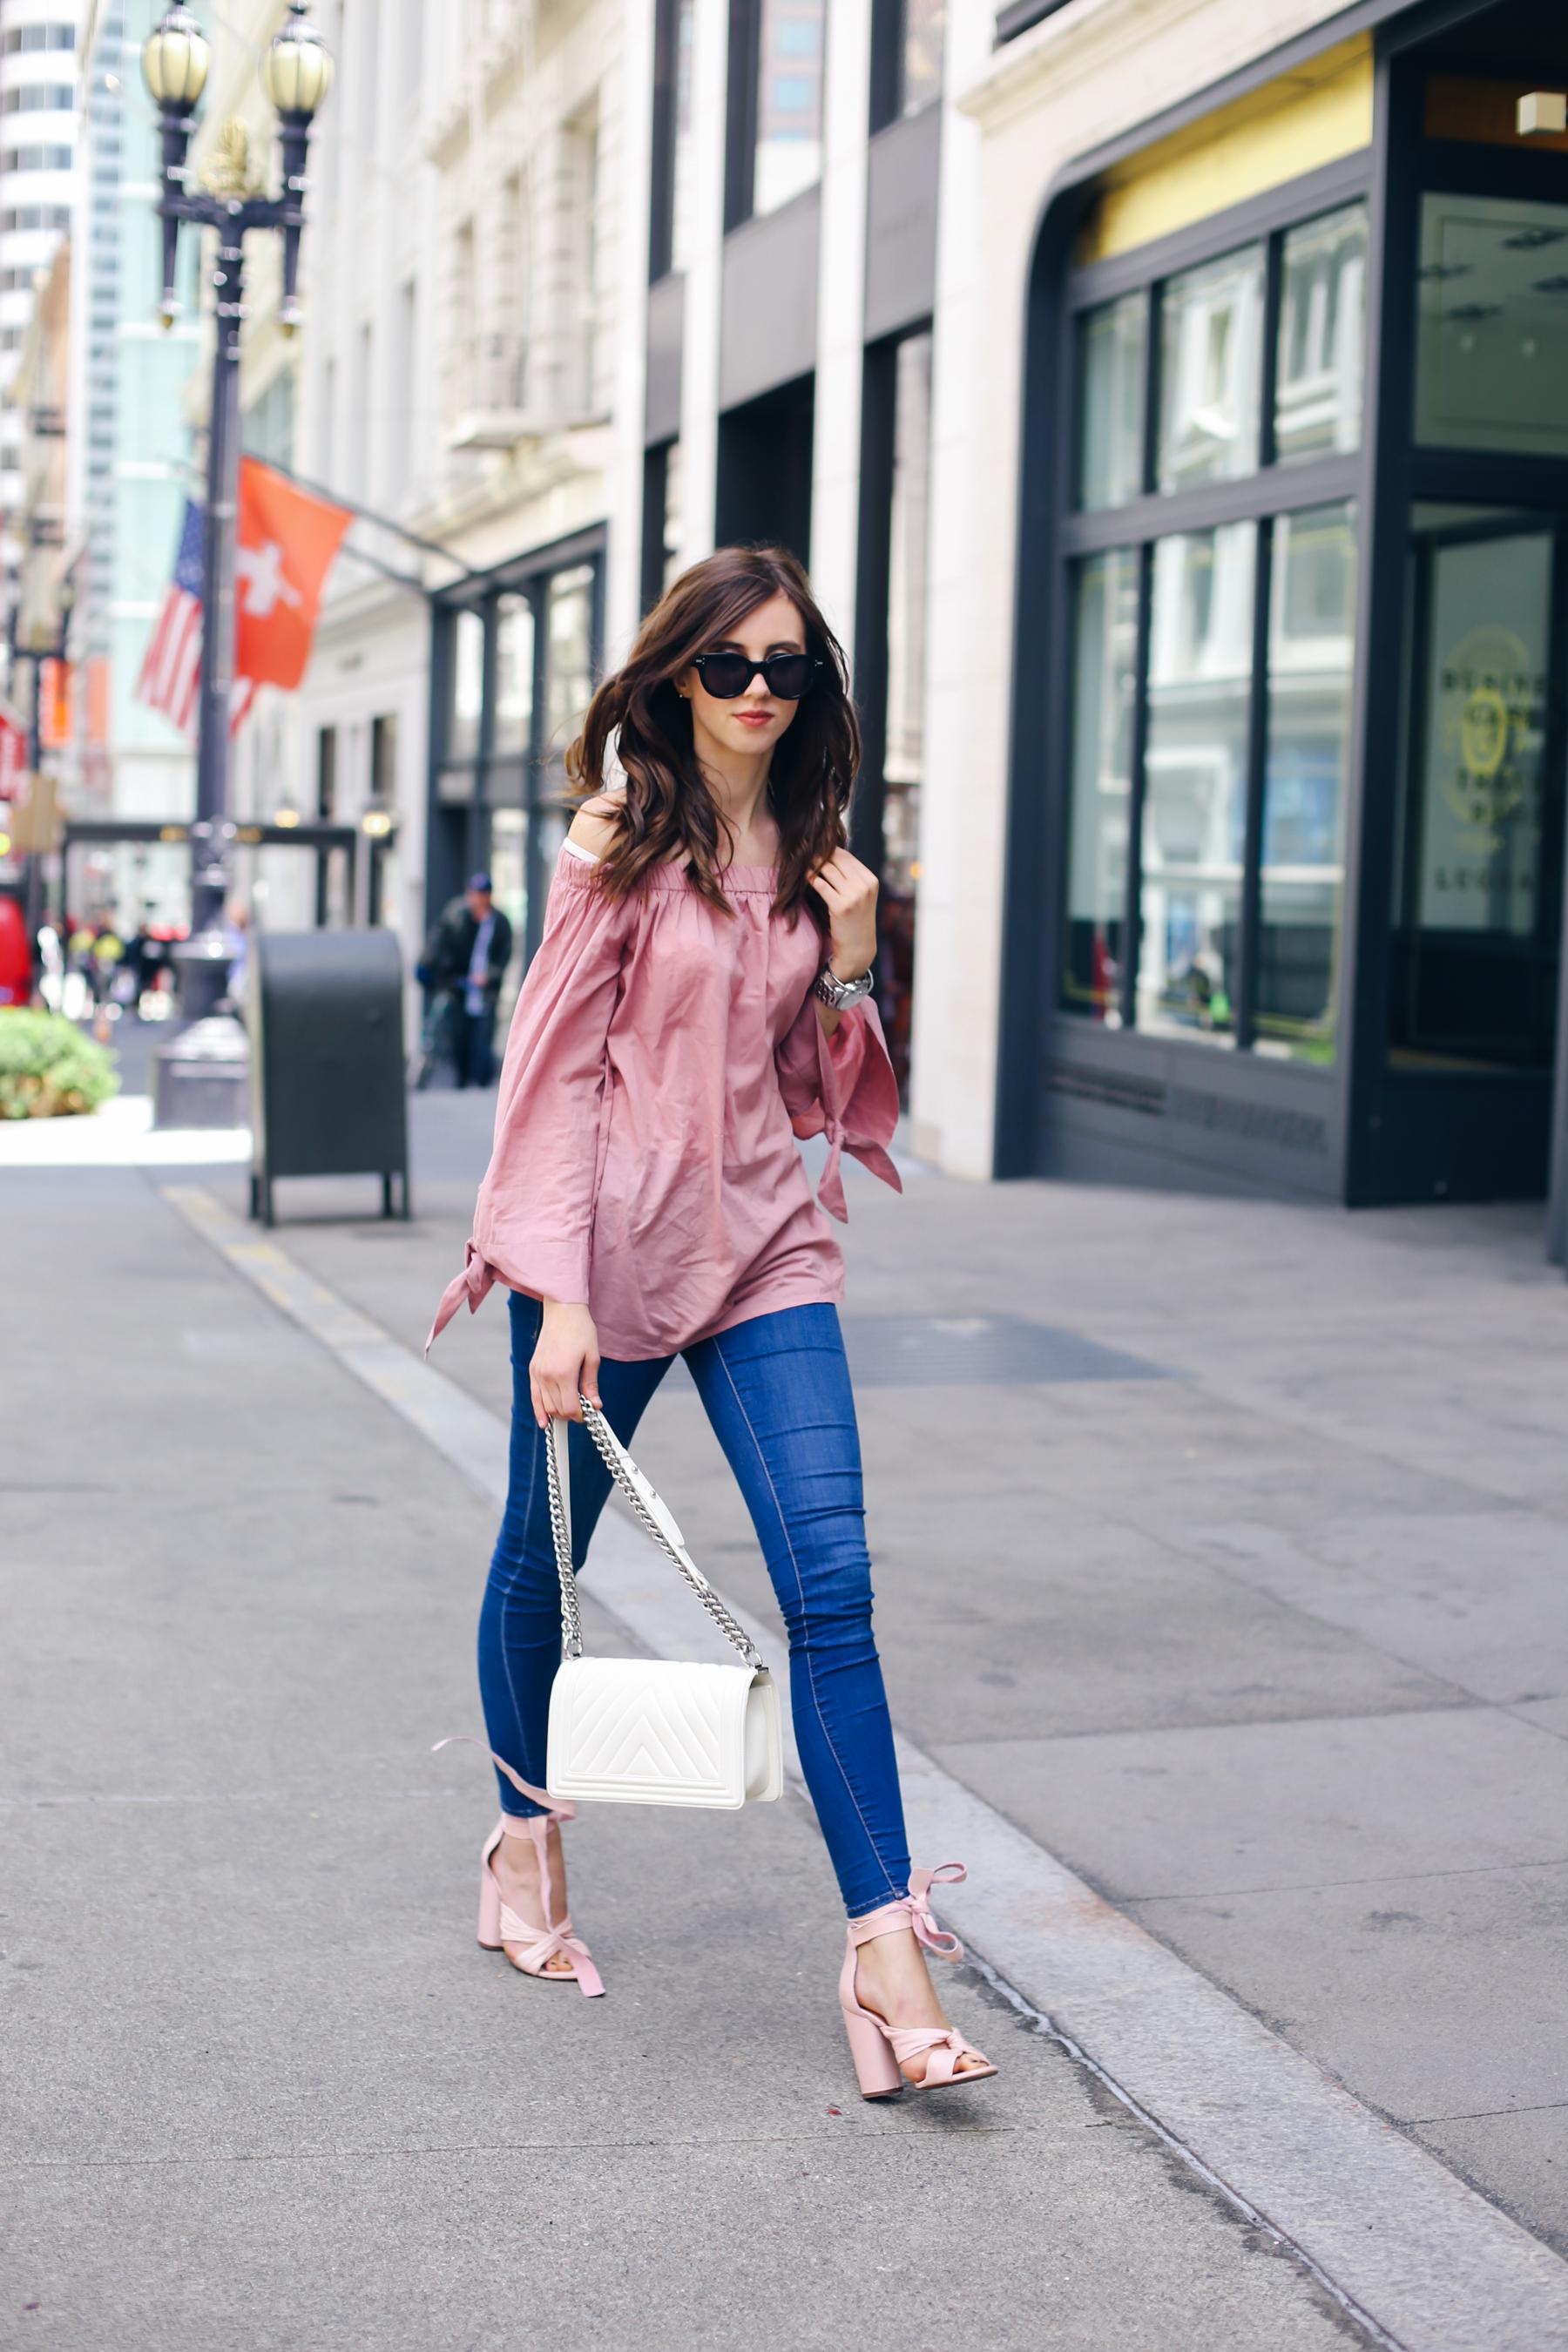 Barbora-Ondracova-FashioninmySoul-Fashion-Blogger-Photography-RyanbyRyanChua-7204